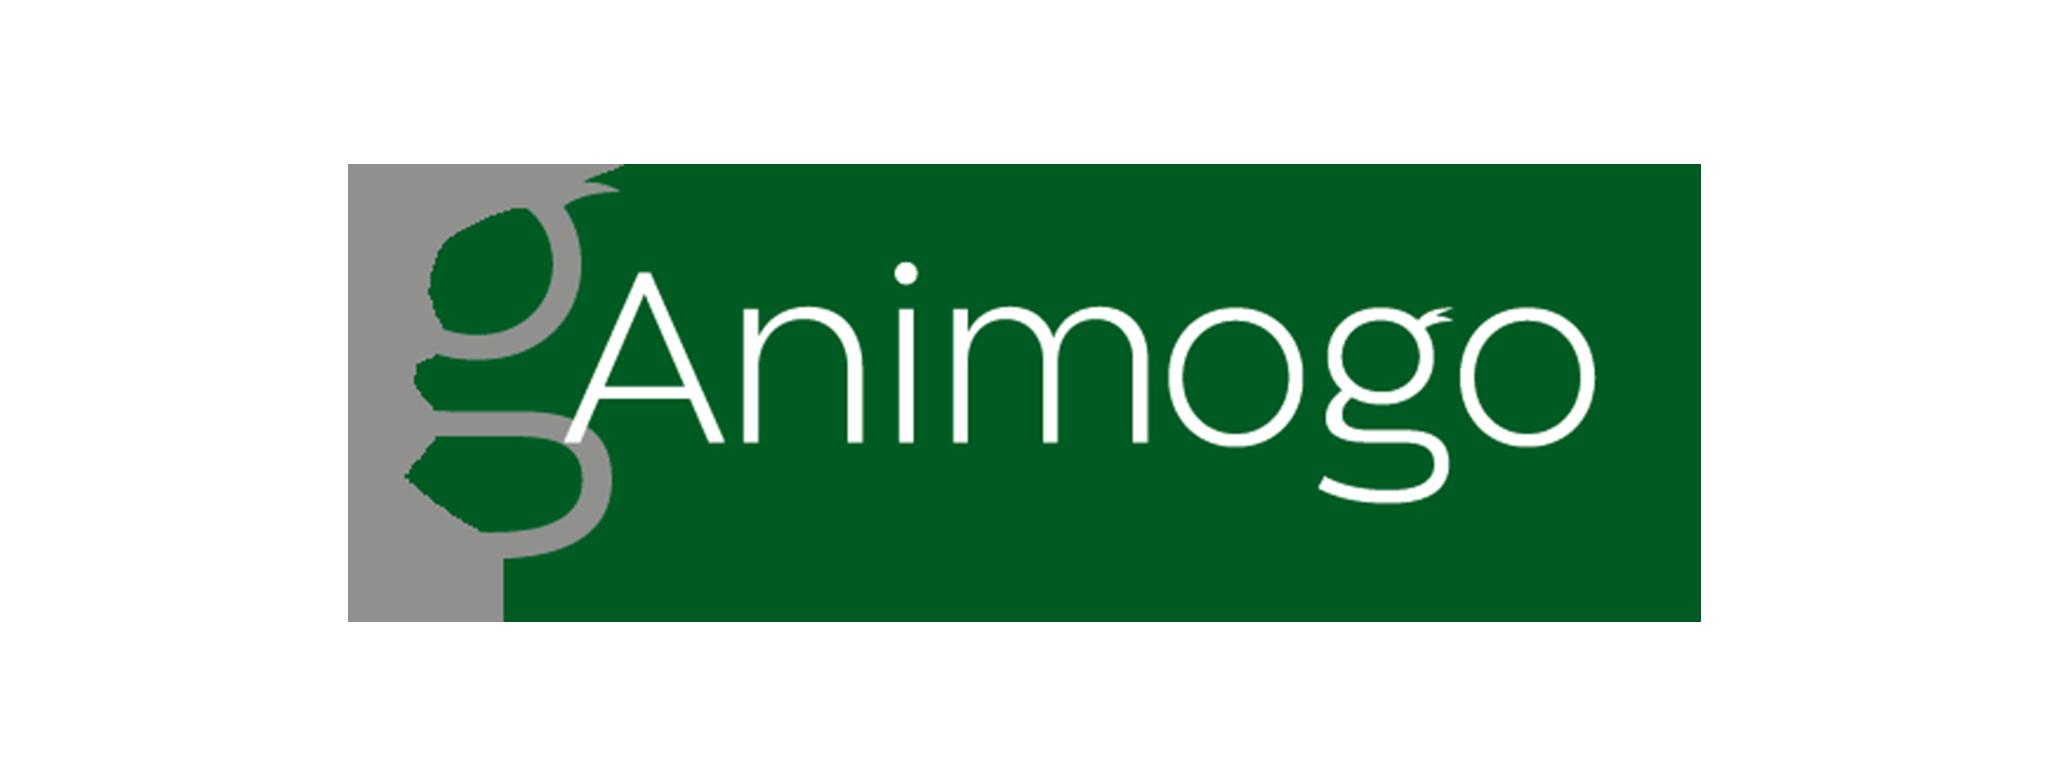 חיות - WinStore